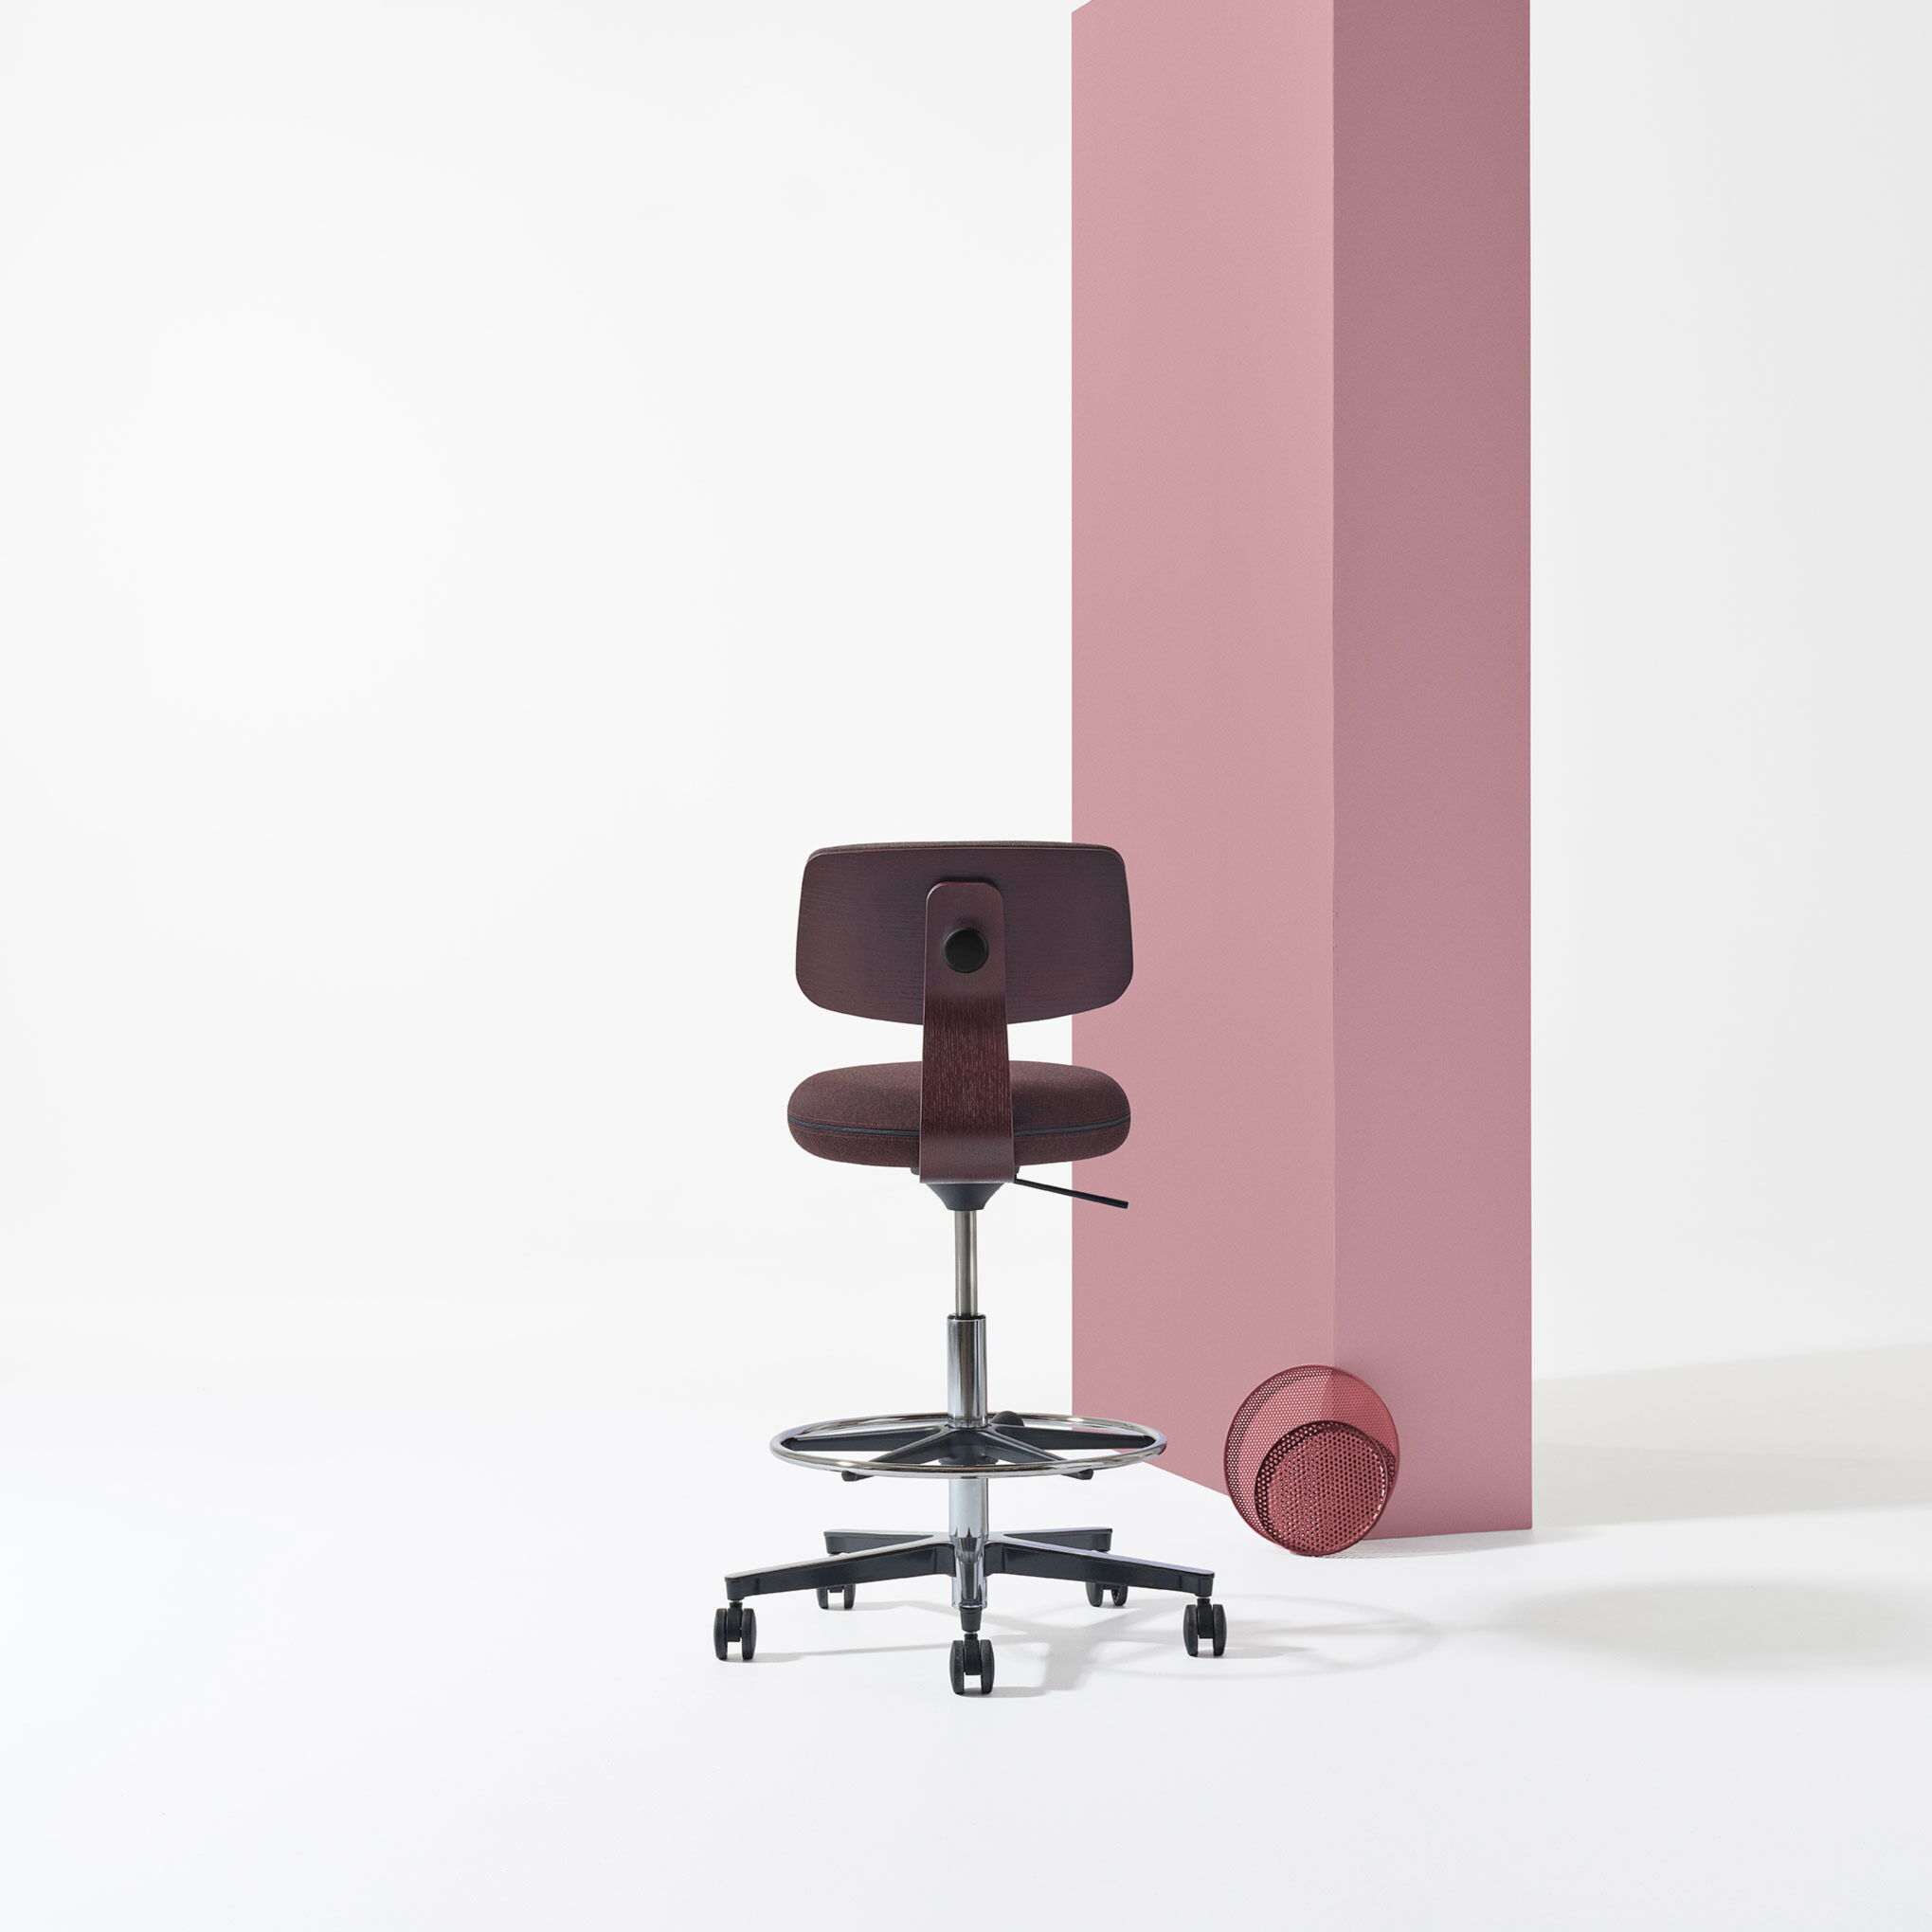 Savo 360 360 high chair product image 3